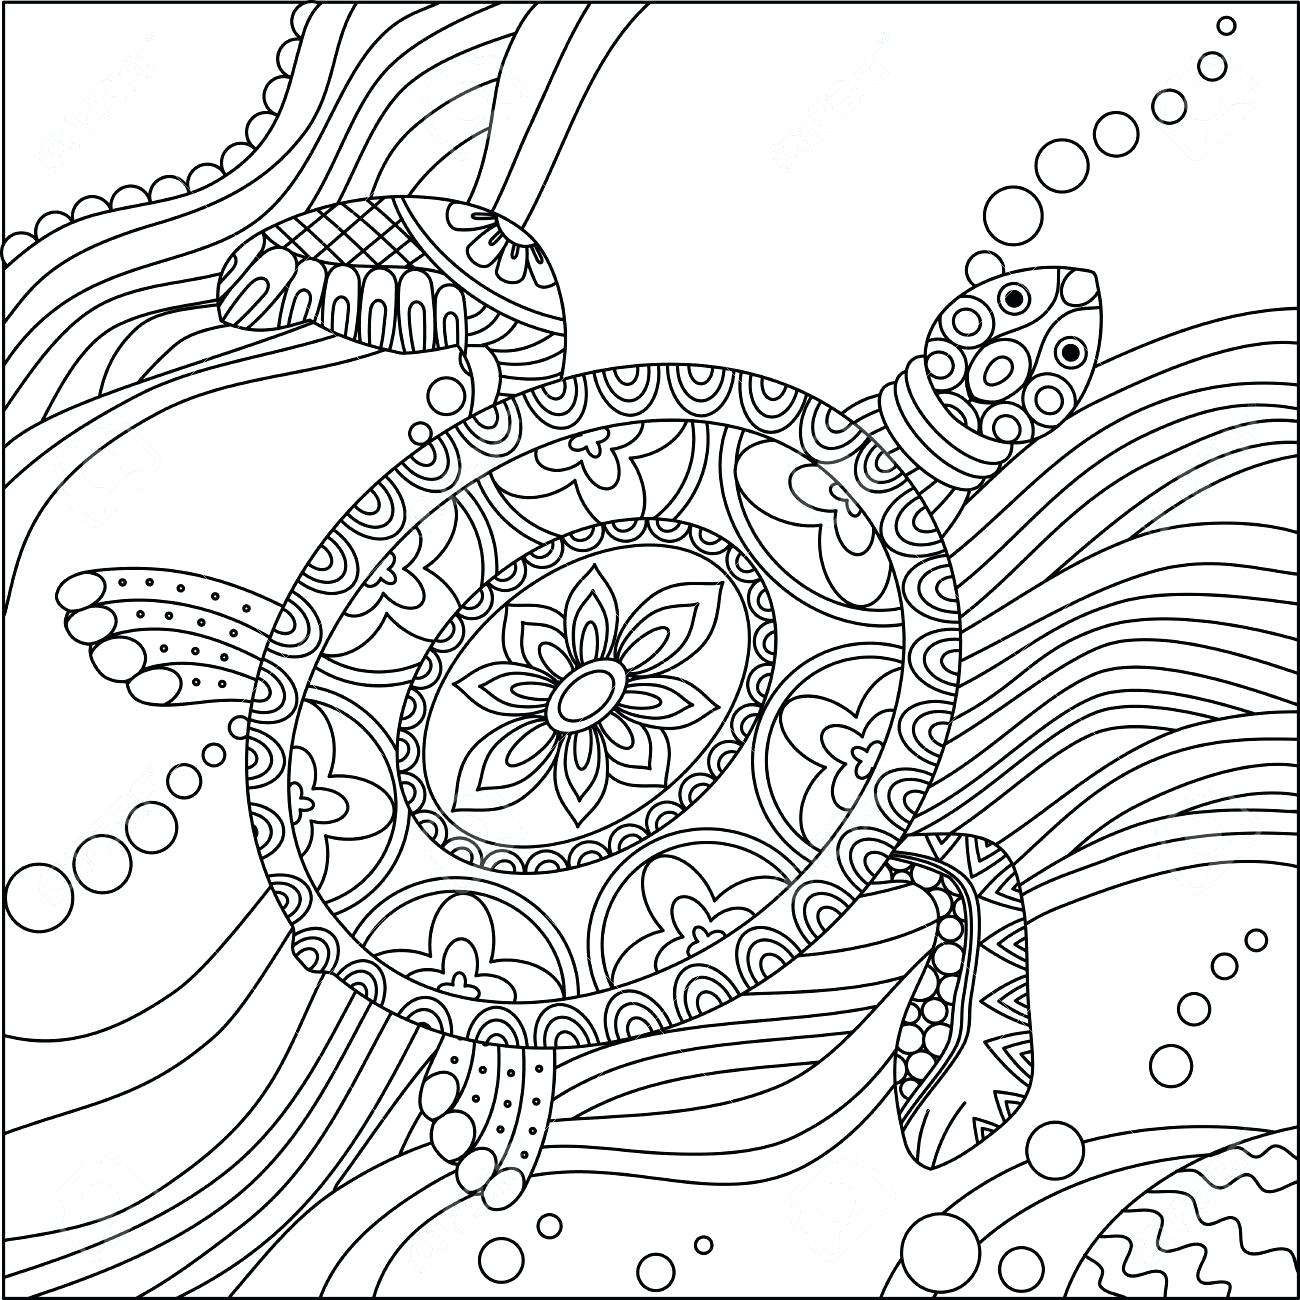 Leatherback Sea Turtle Drawing At Getdrawings